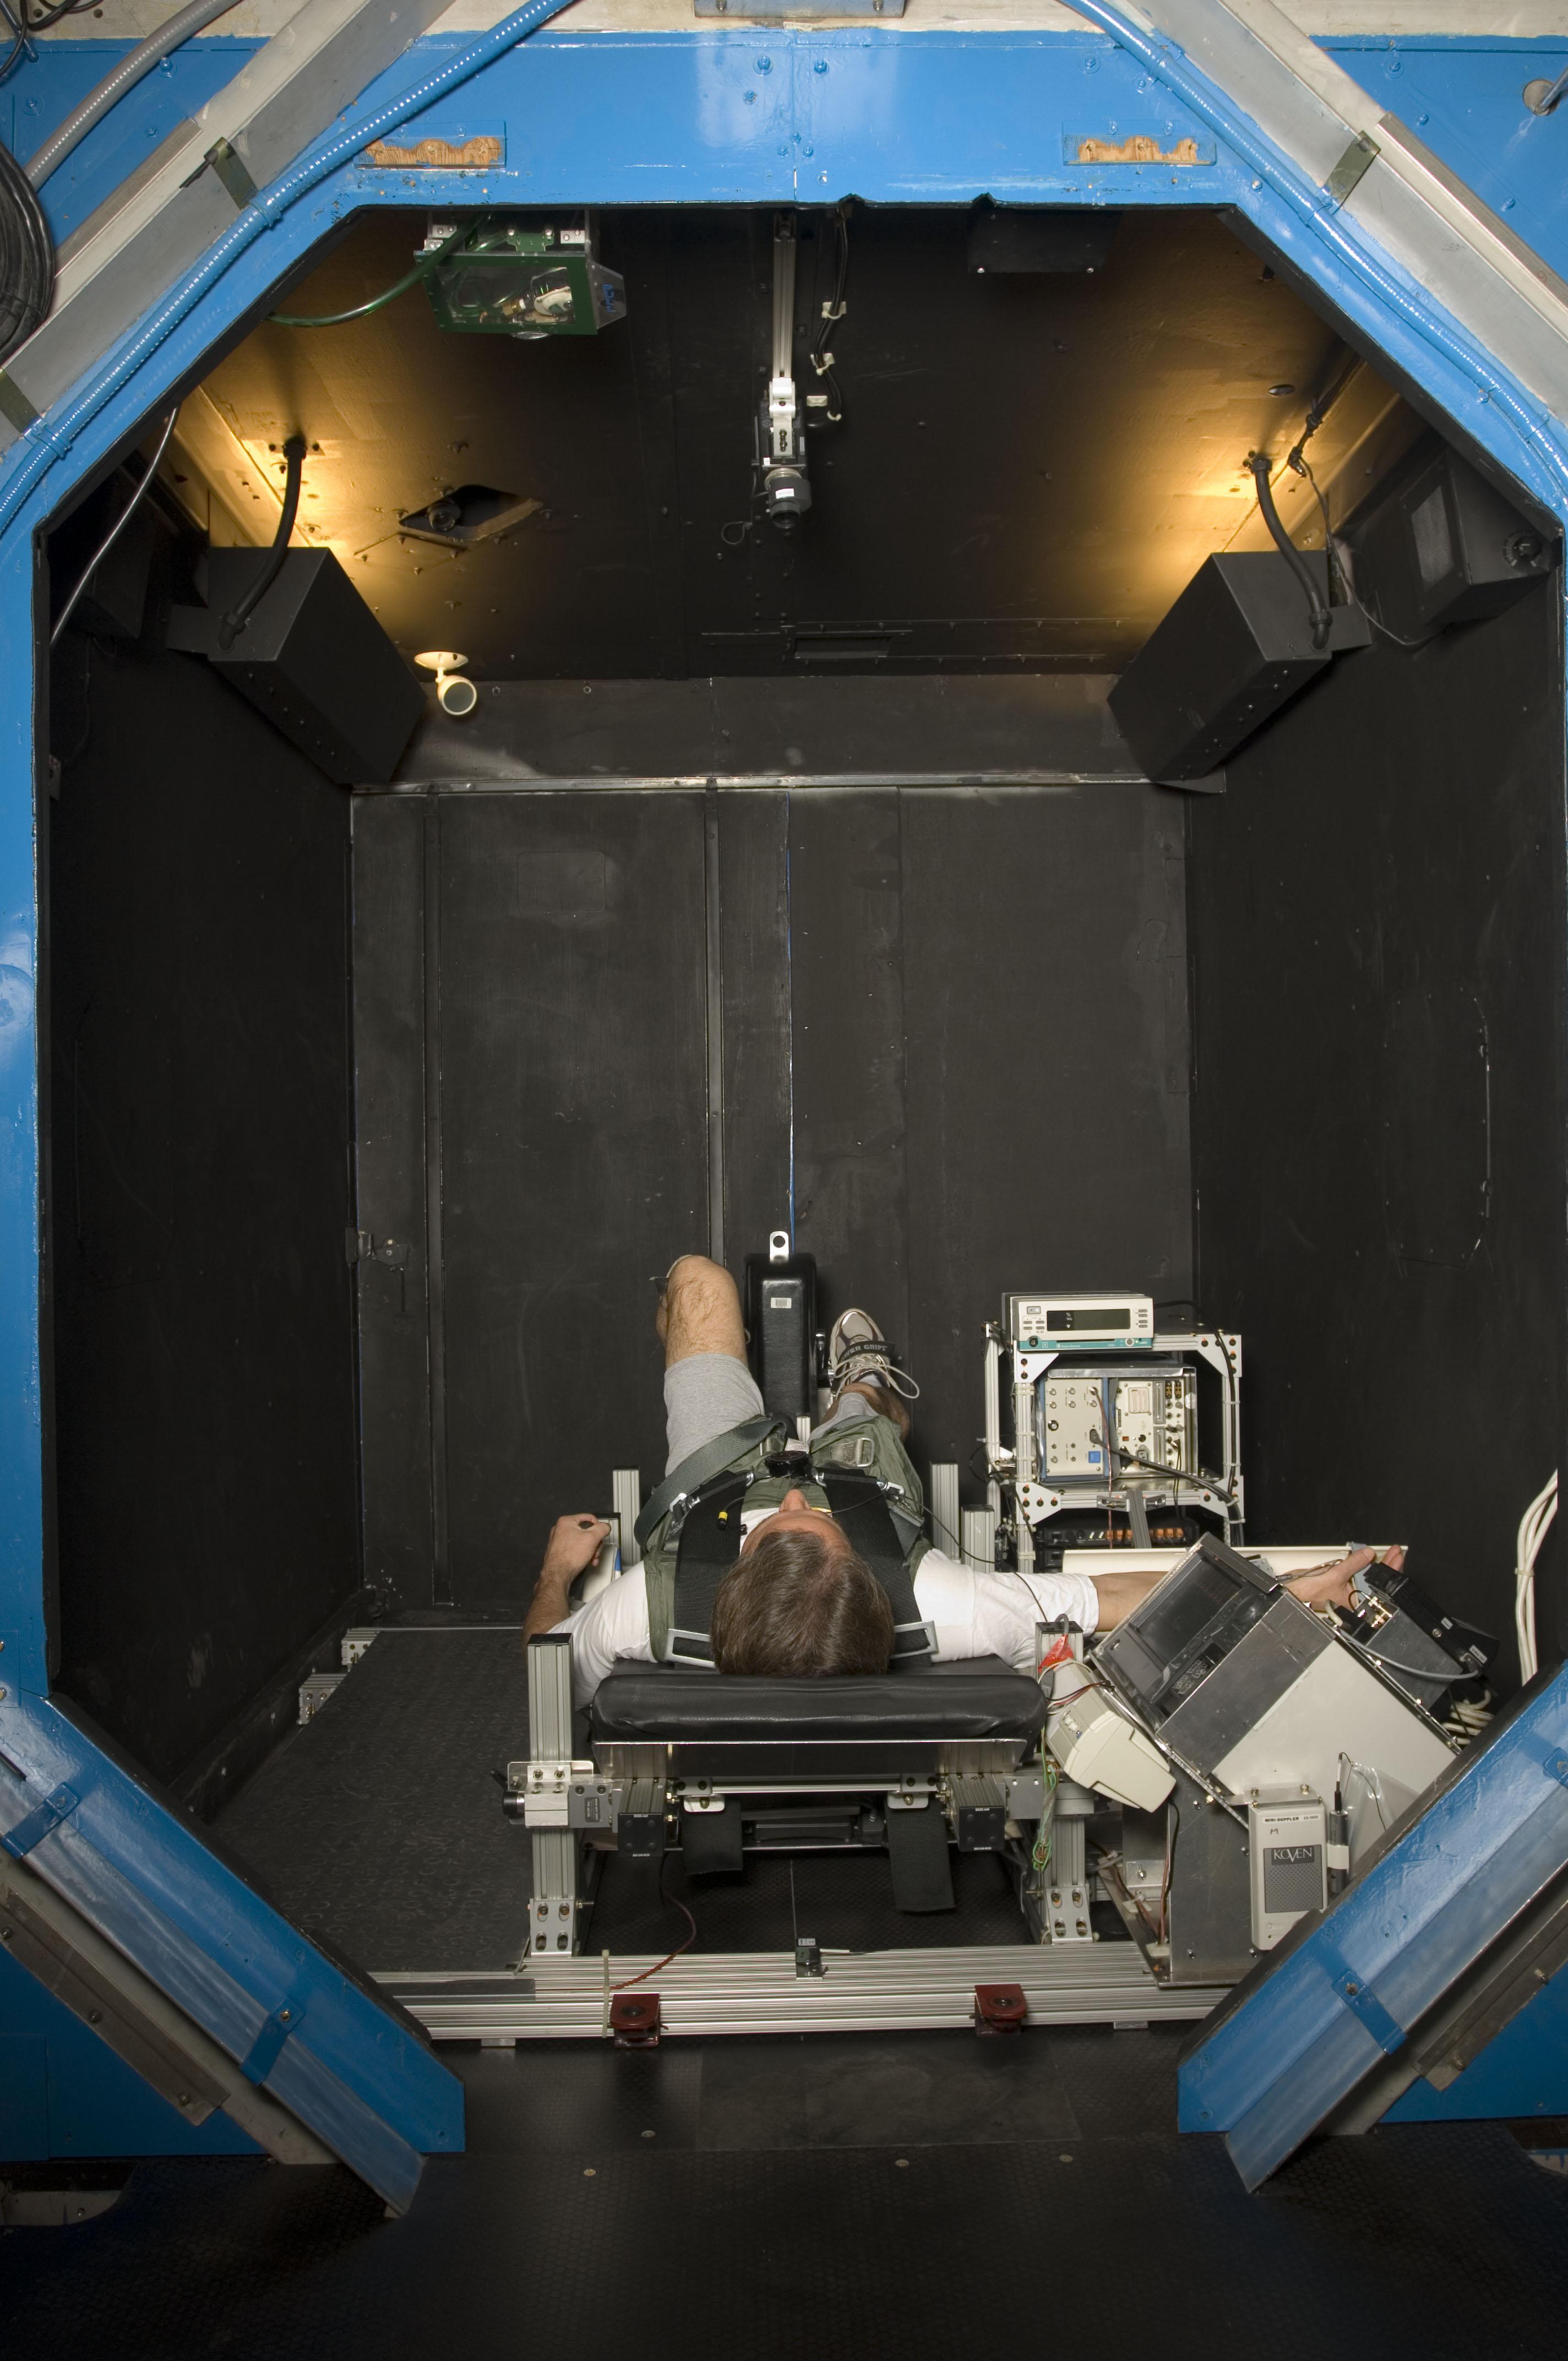 centrifuge nasa - photo #14